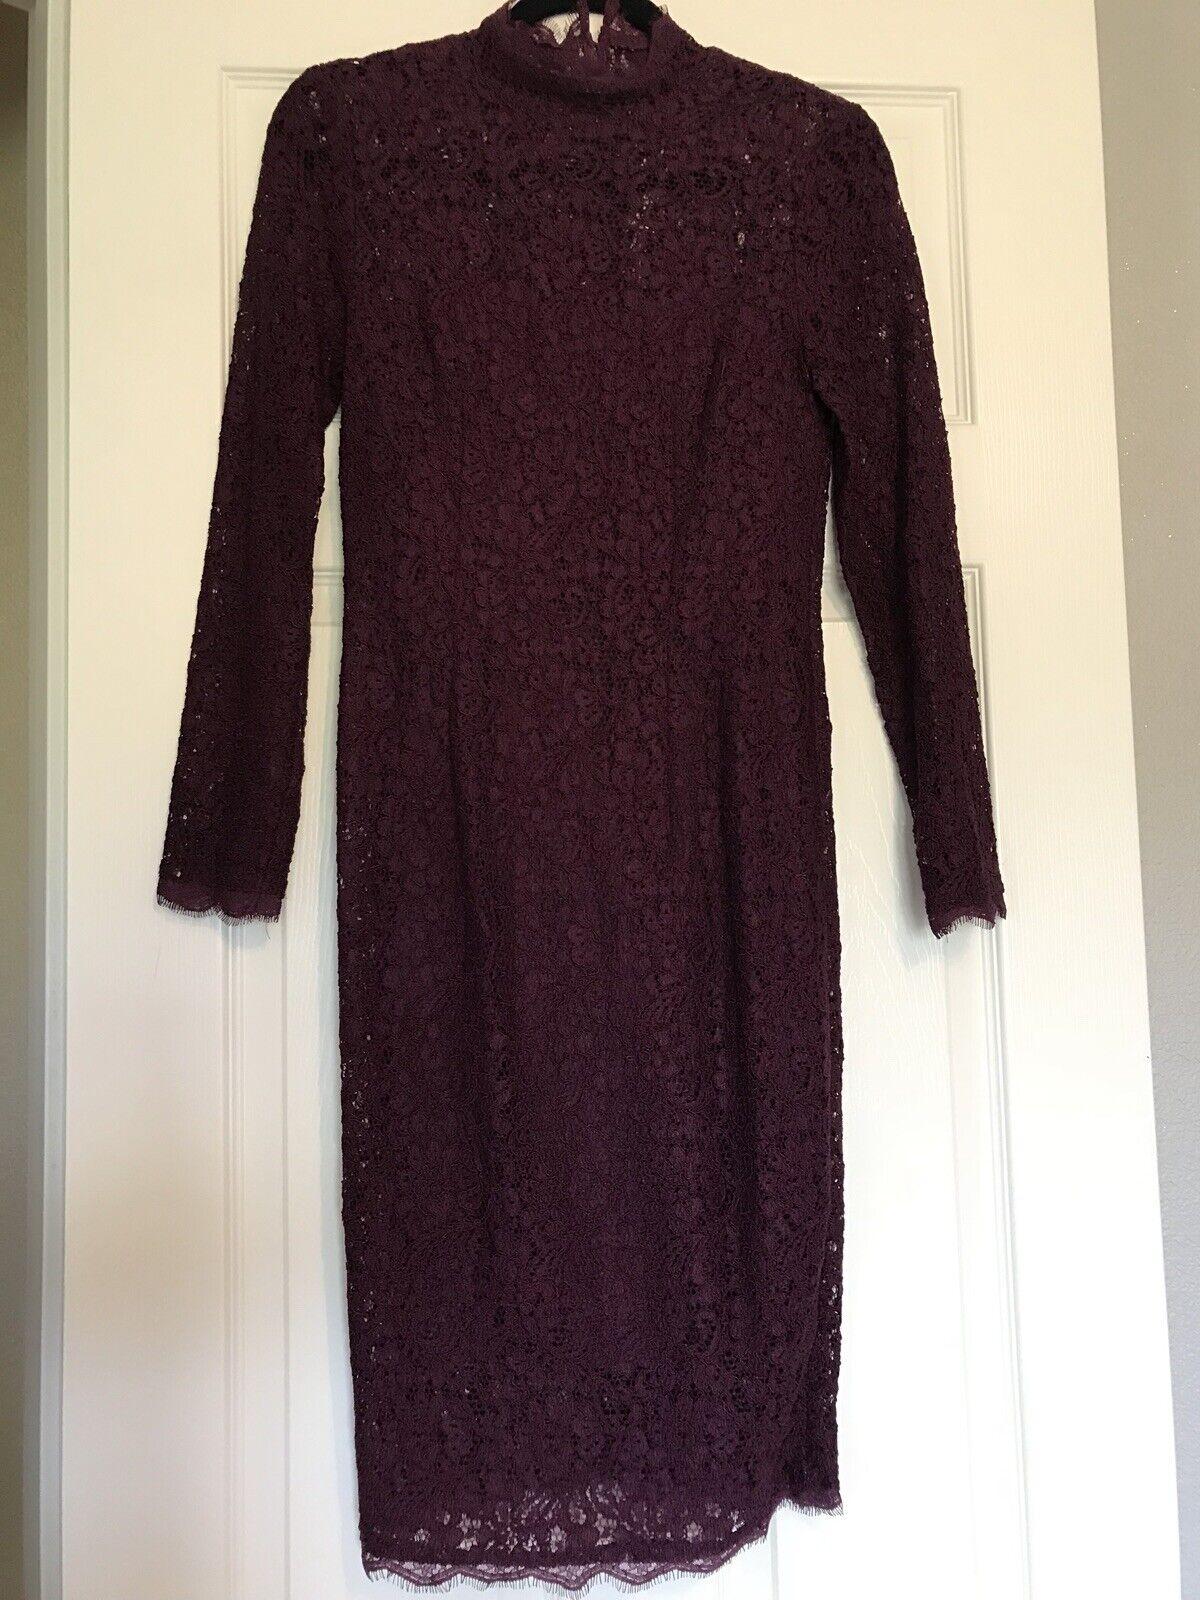 Adrianna papell dress Größe 2